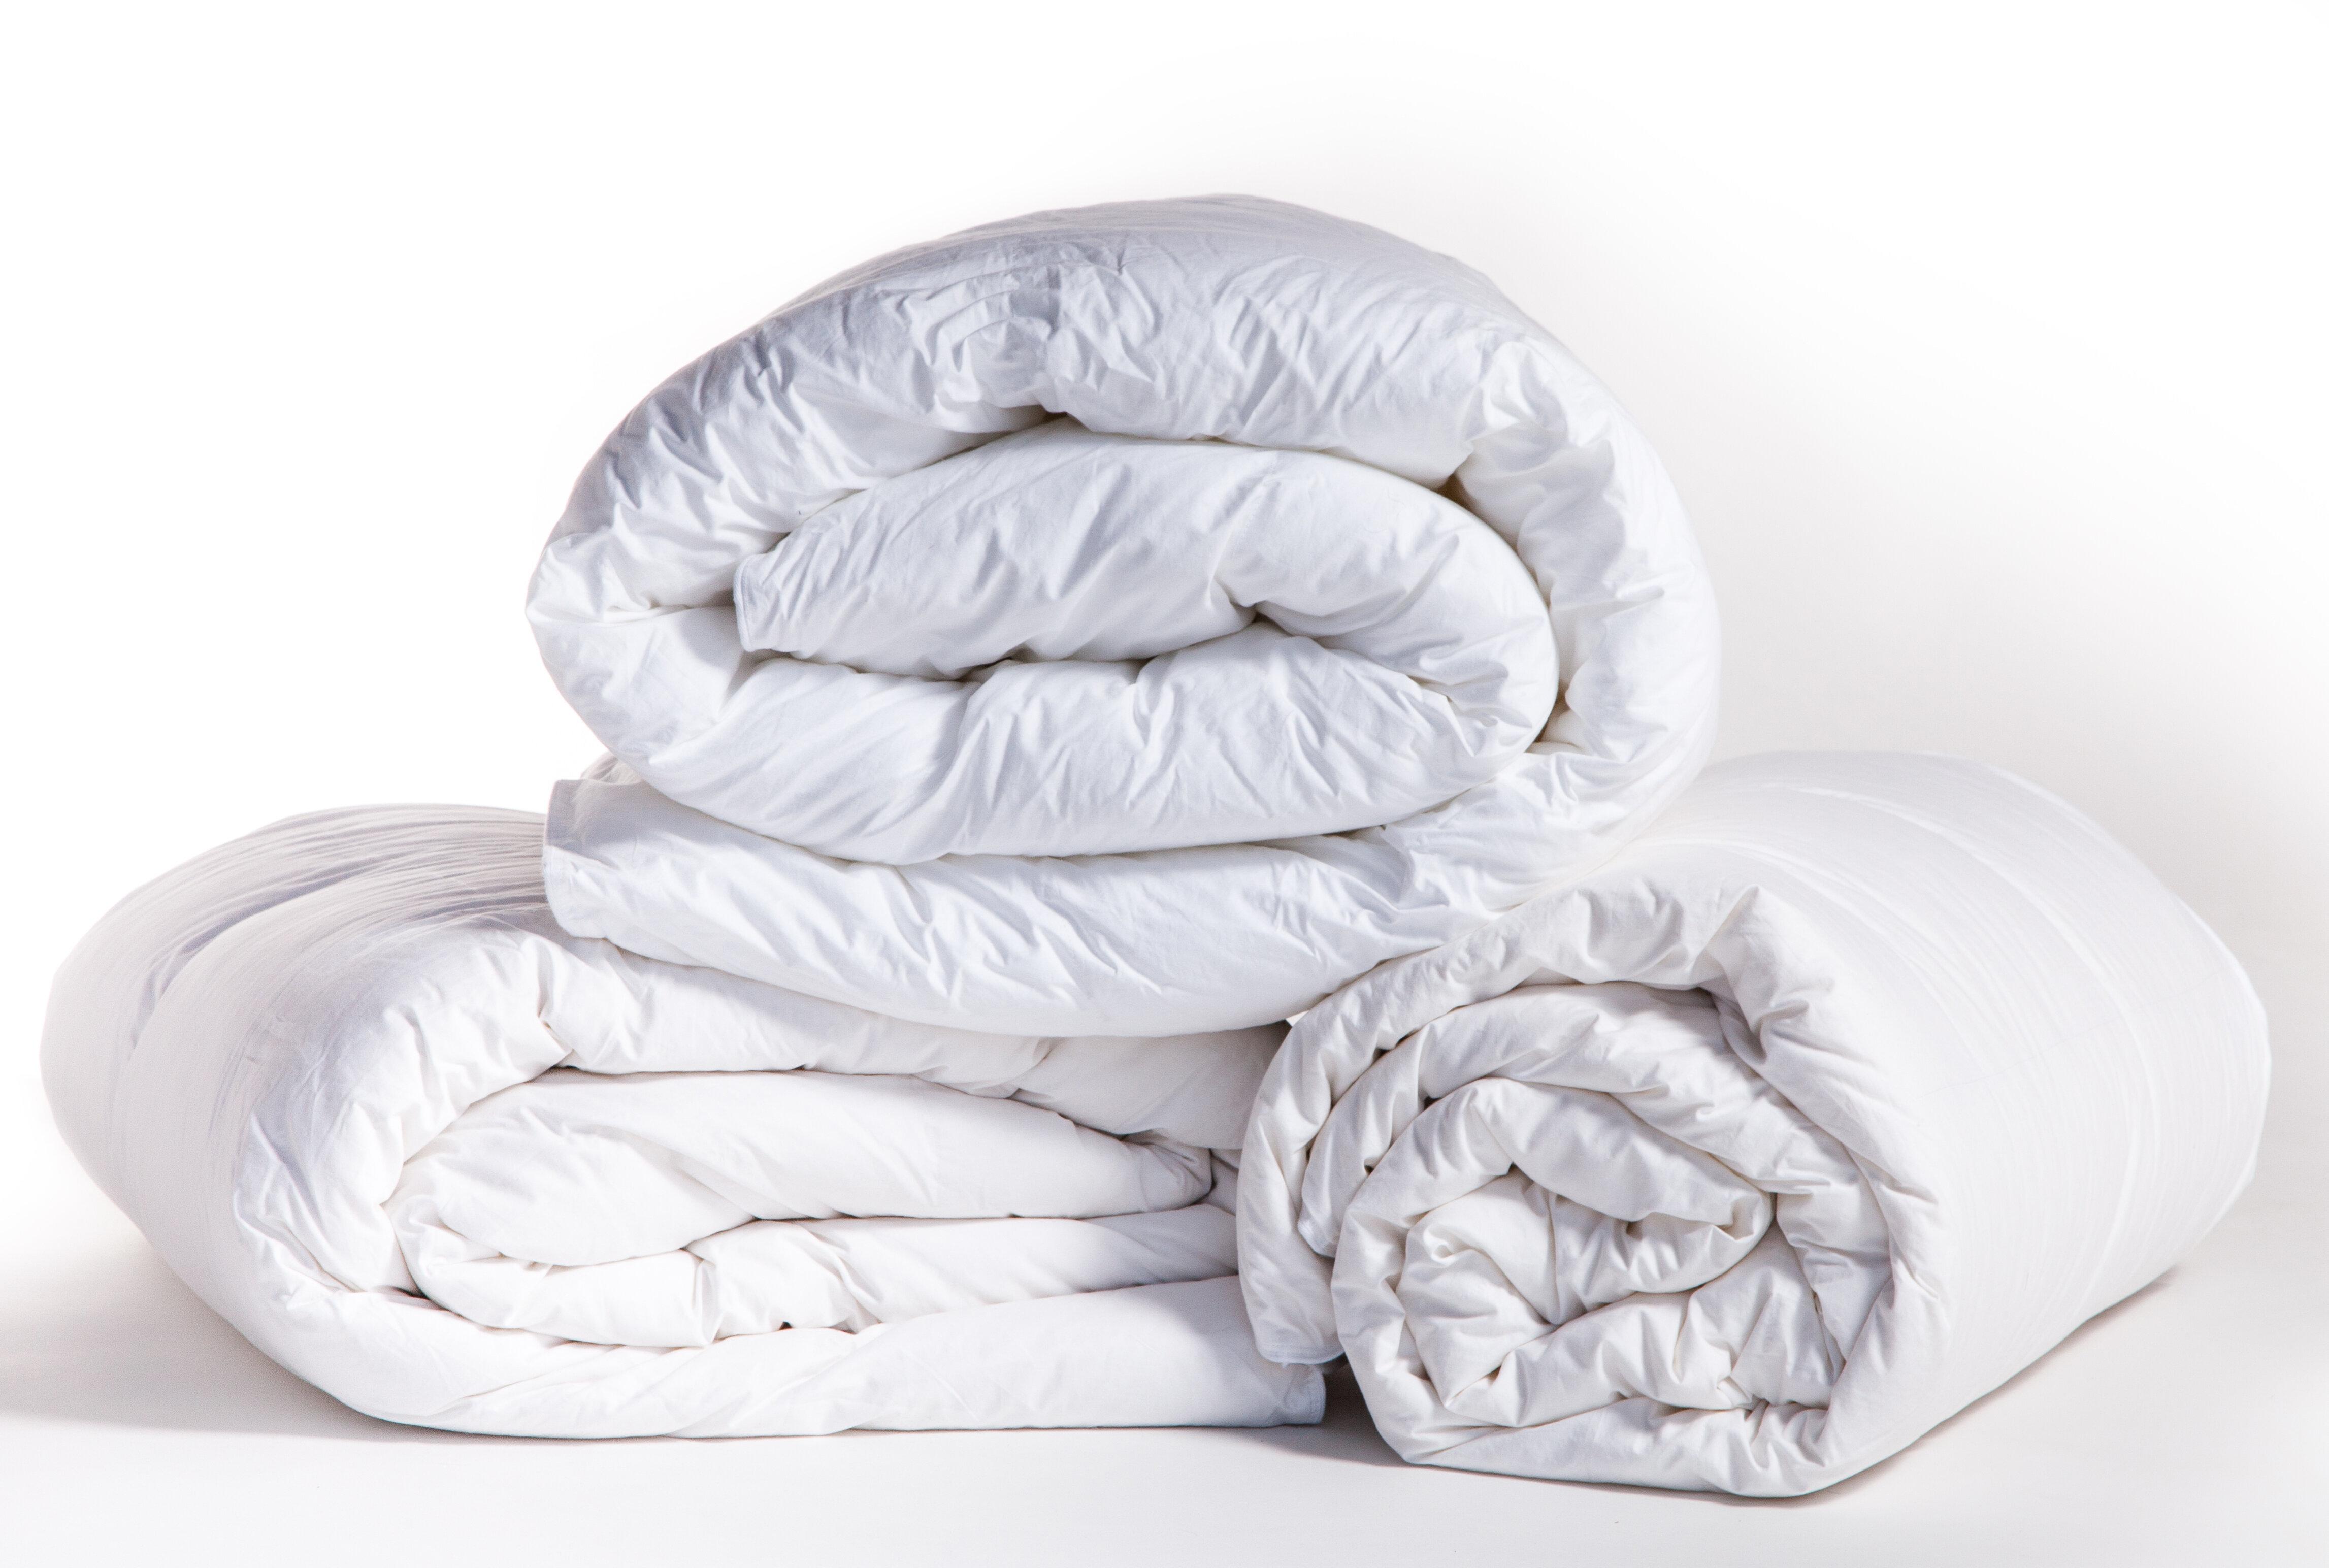 duvets all comforters duvet parachute season alternative and pillows down collections lp insert